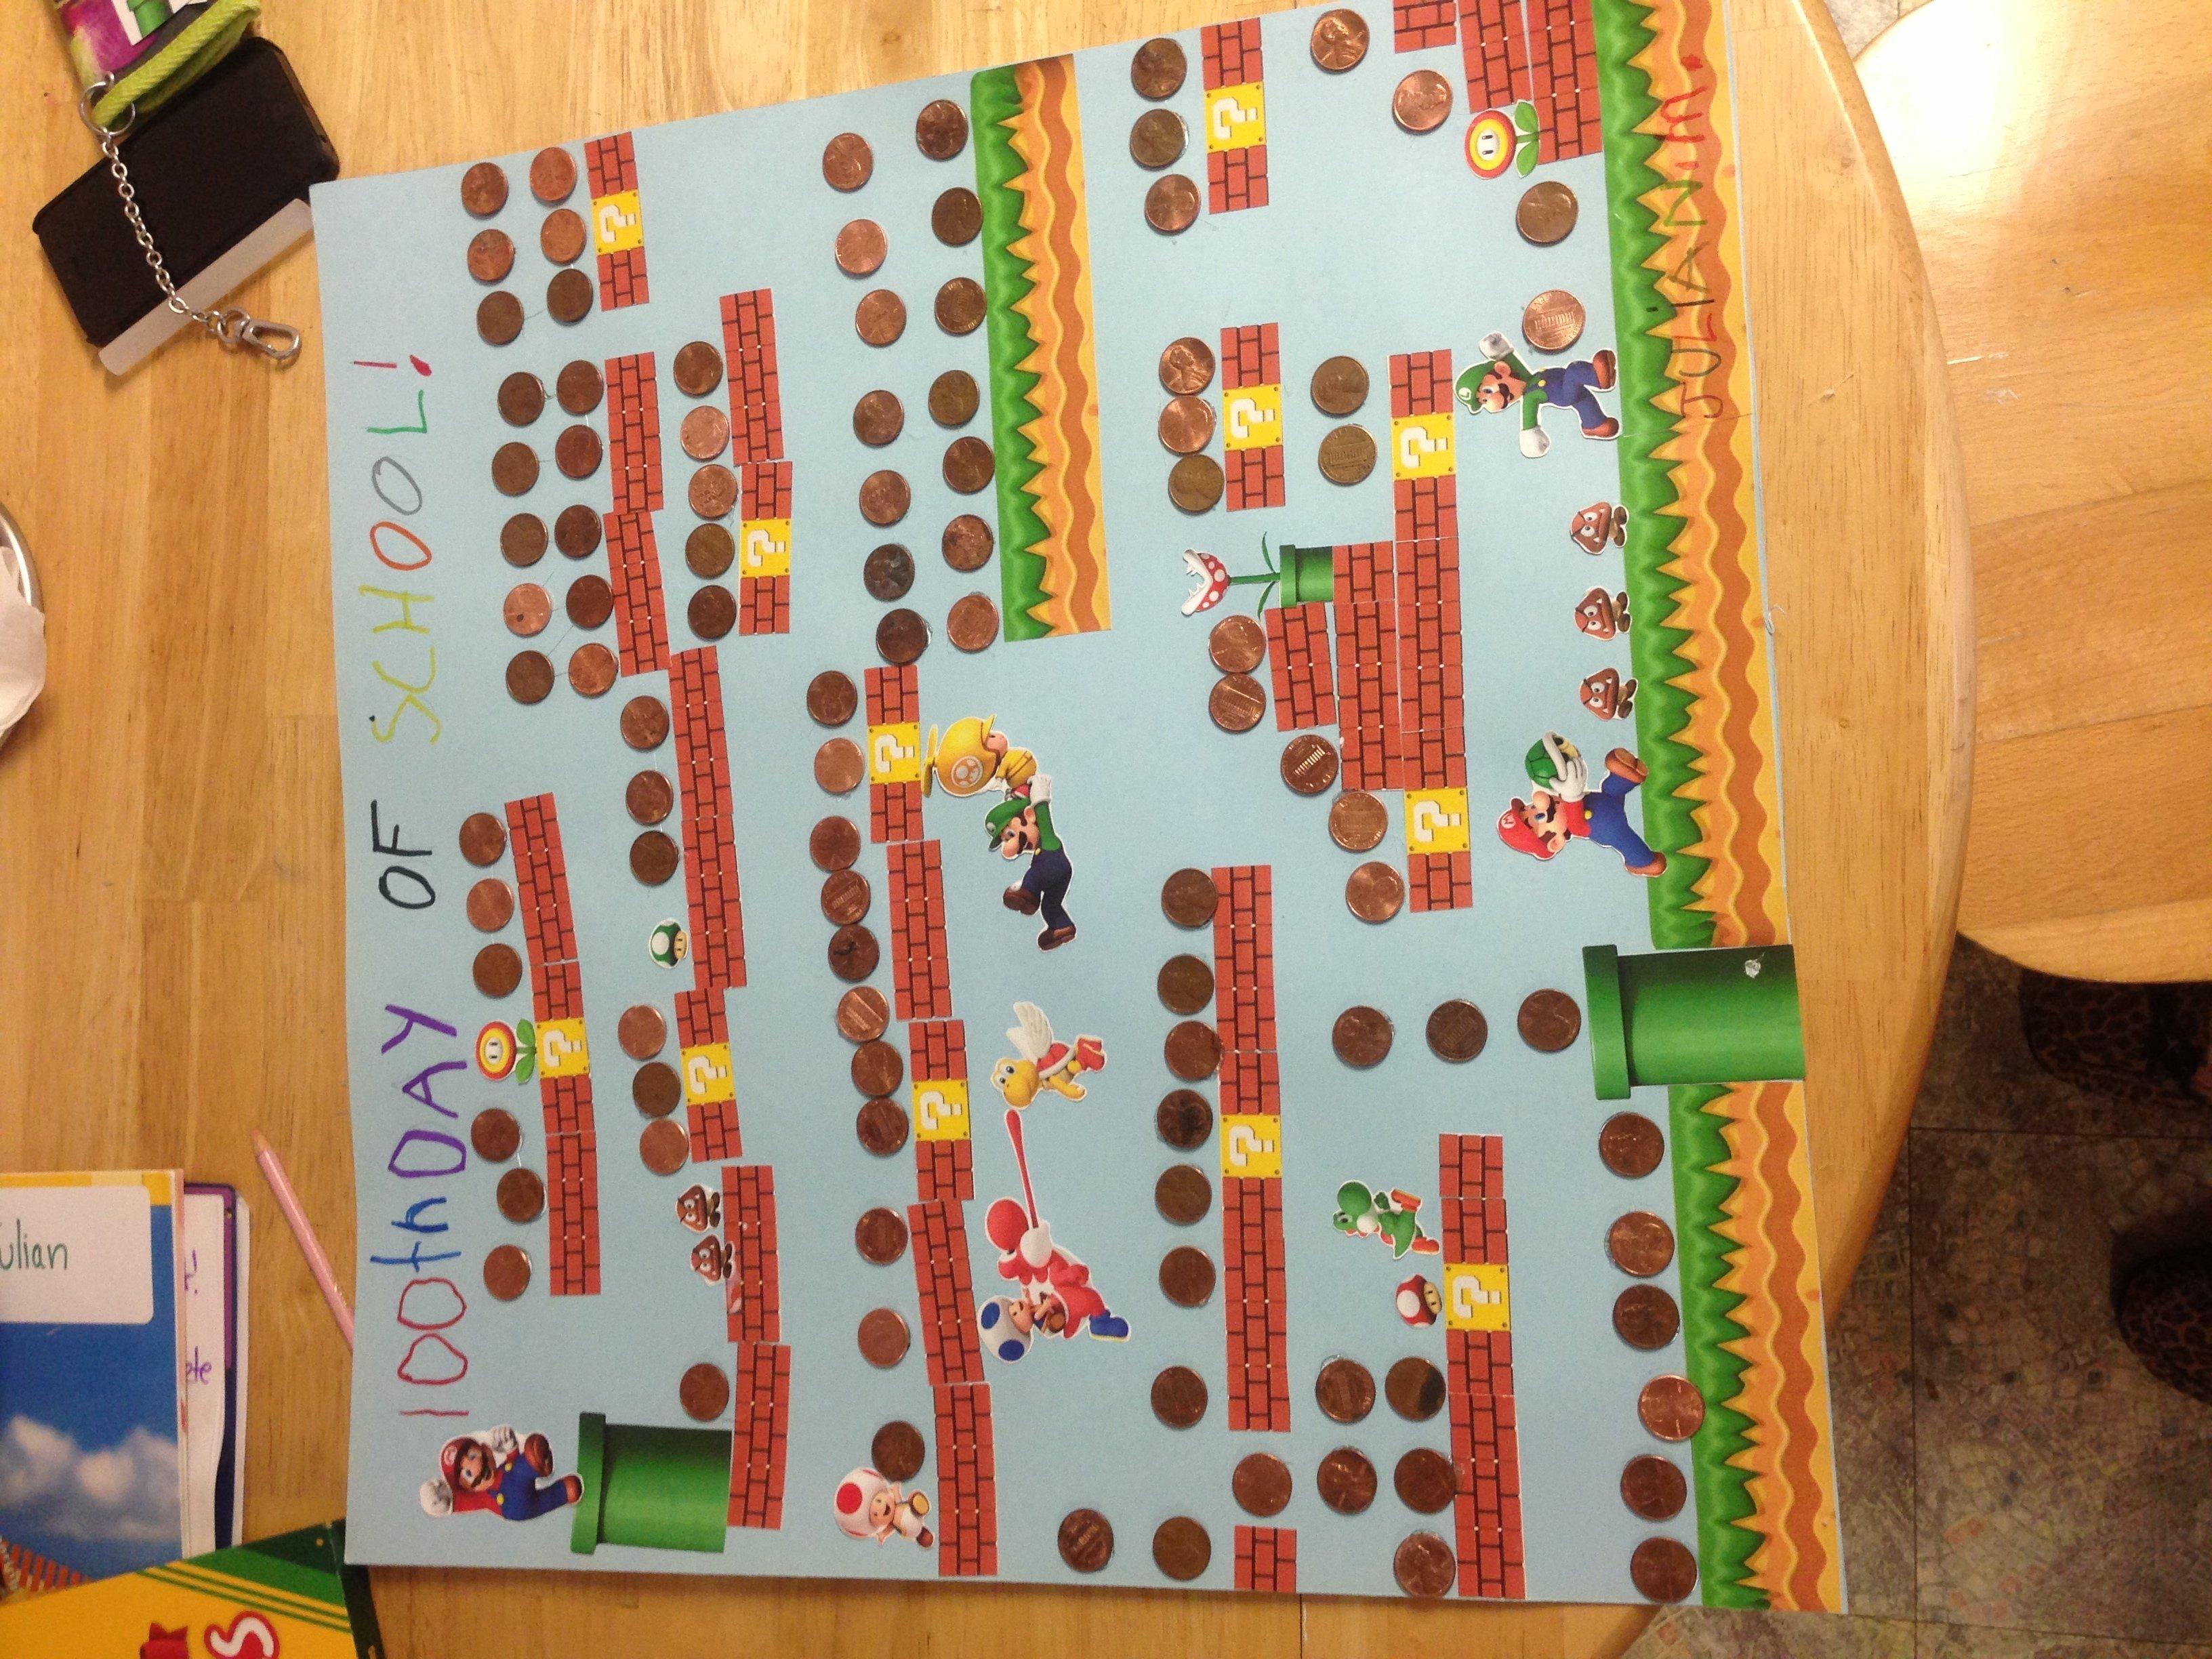 10 Perfect 100 Days Of School Poster Ideas 100th day of school super mario bros kids pinterest super 1